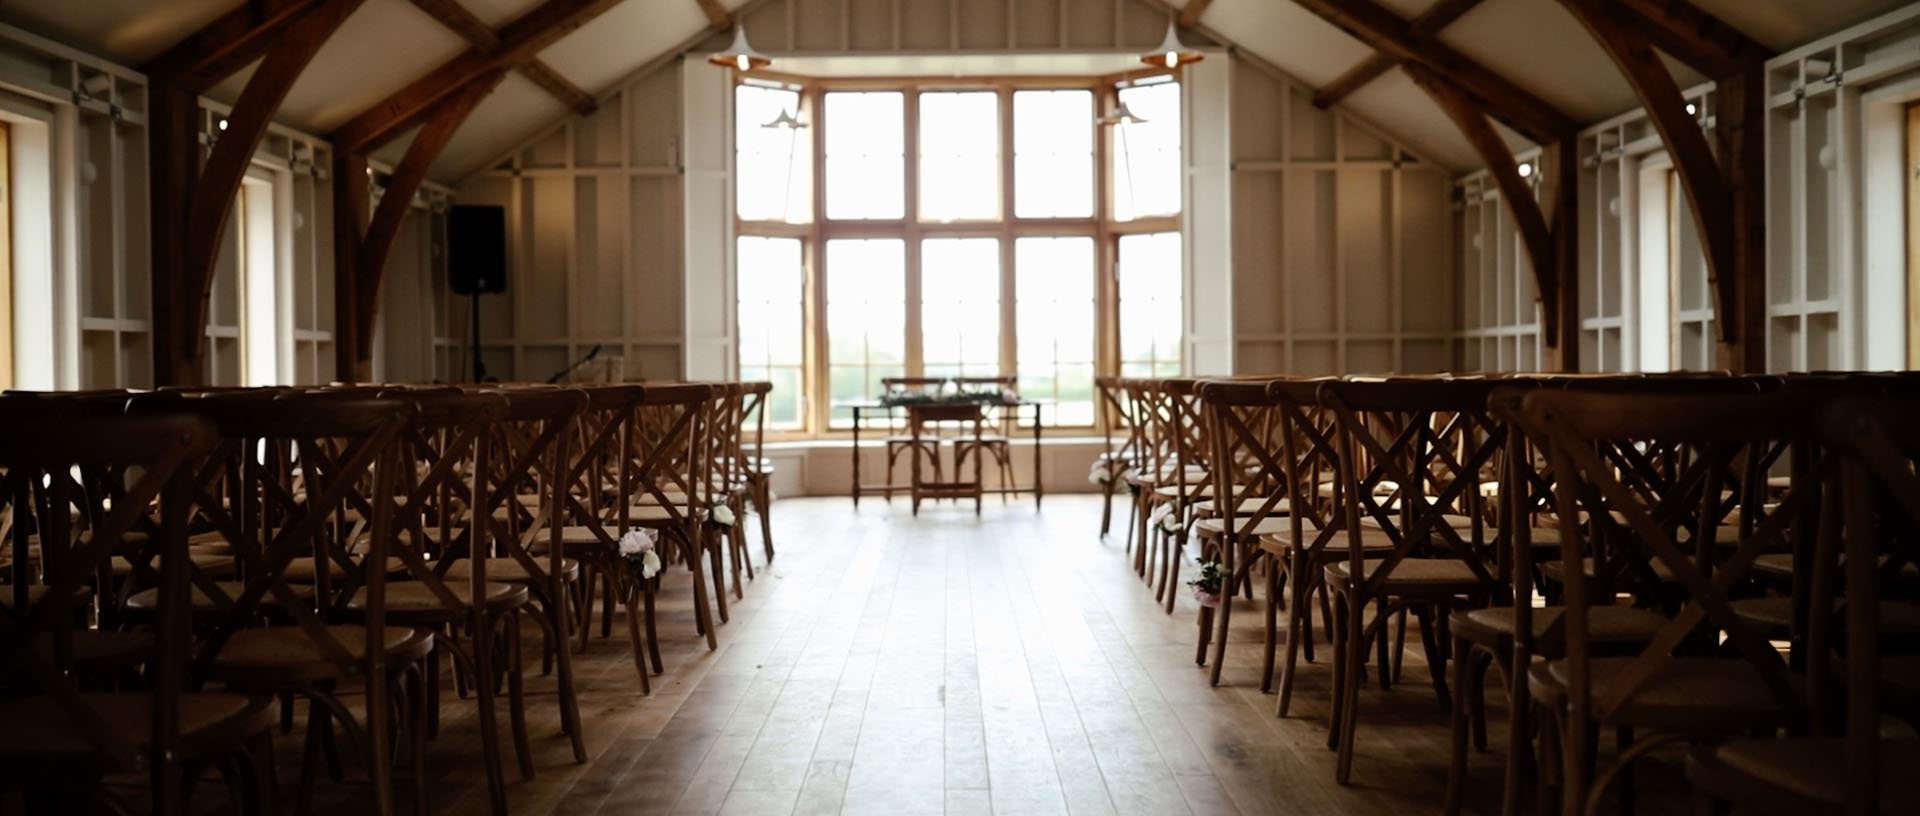 Hyde Barn Colswolds Wedding Verity-Jade & Kai 6 Cropped.jpg